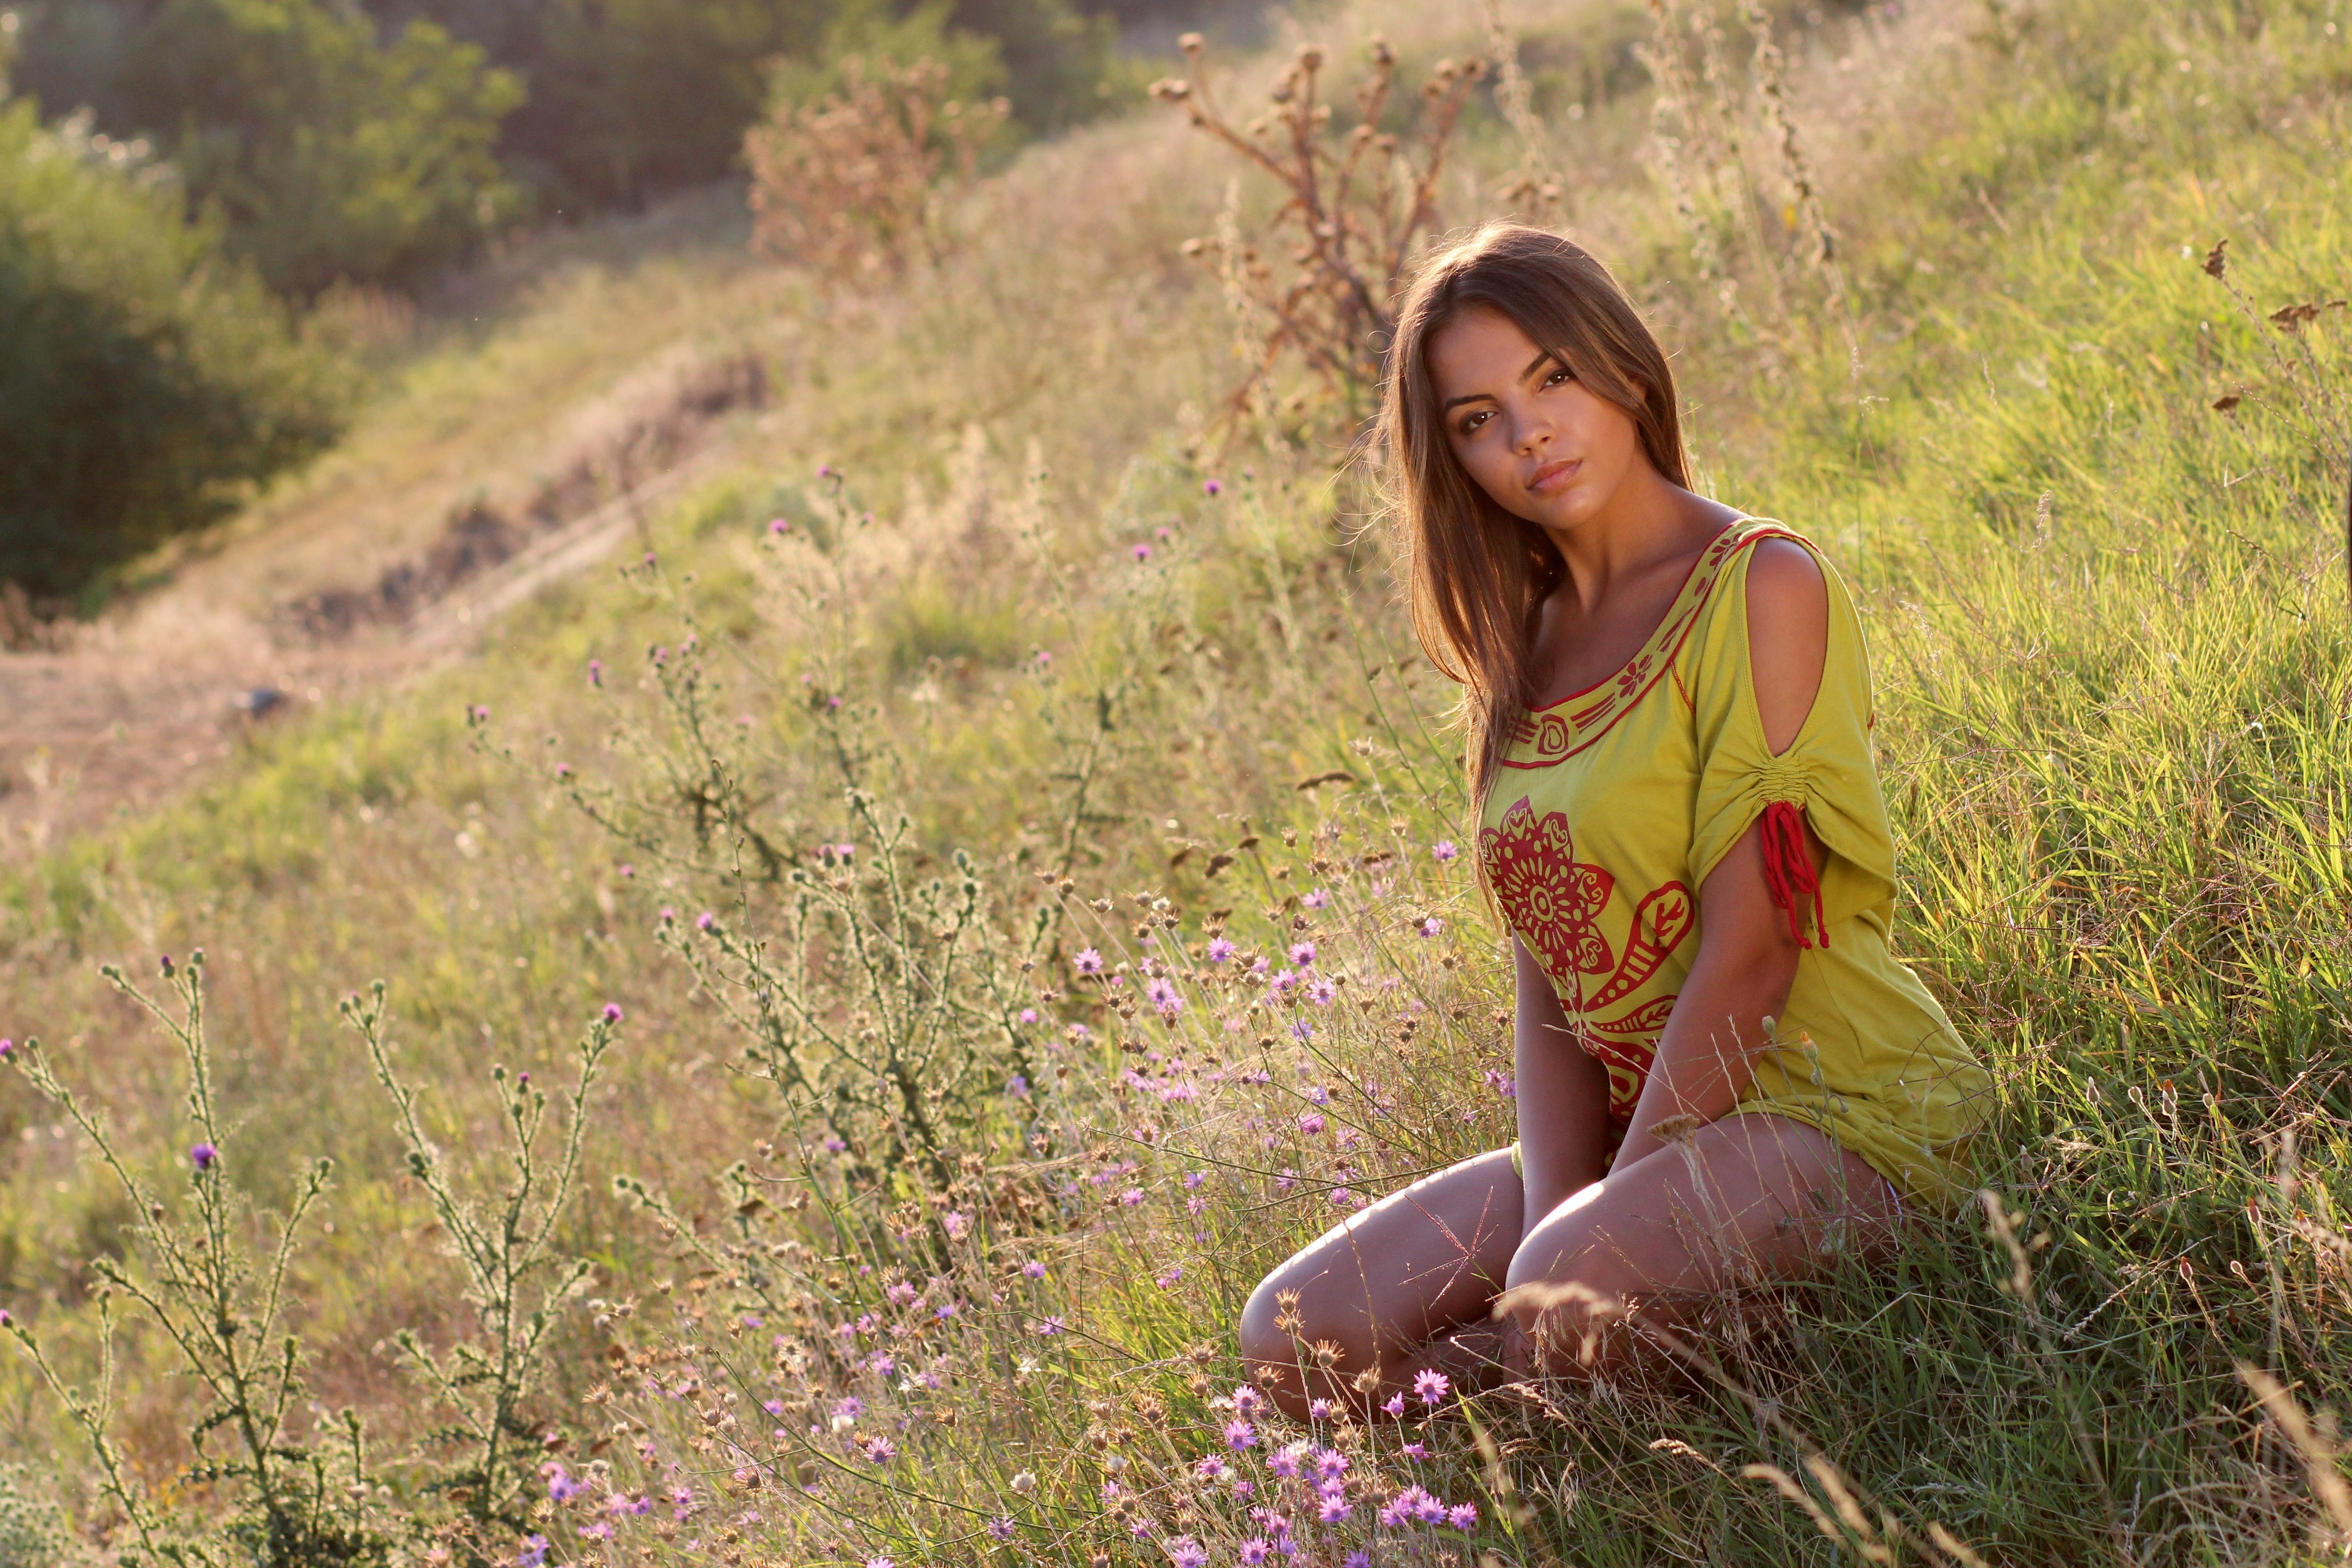 Картинки с фото девушек на природе